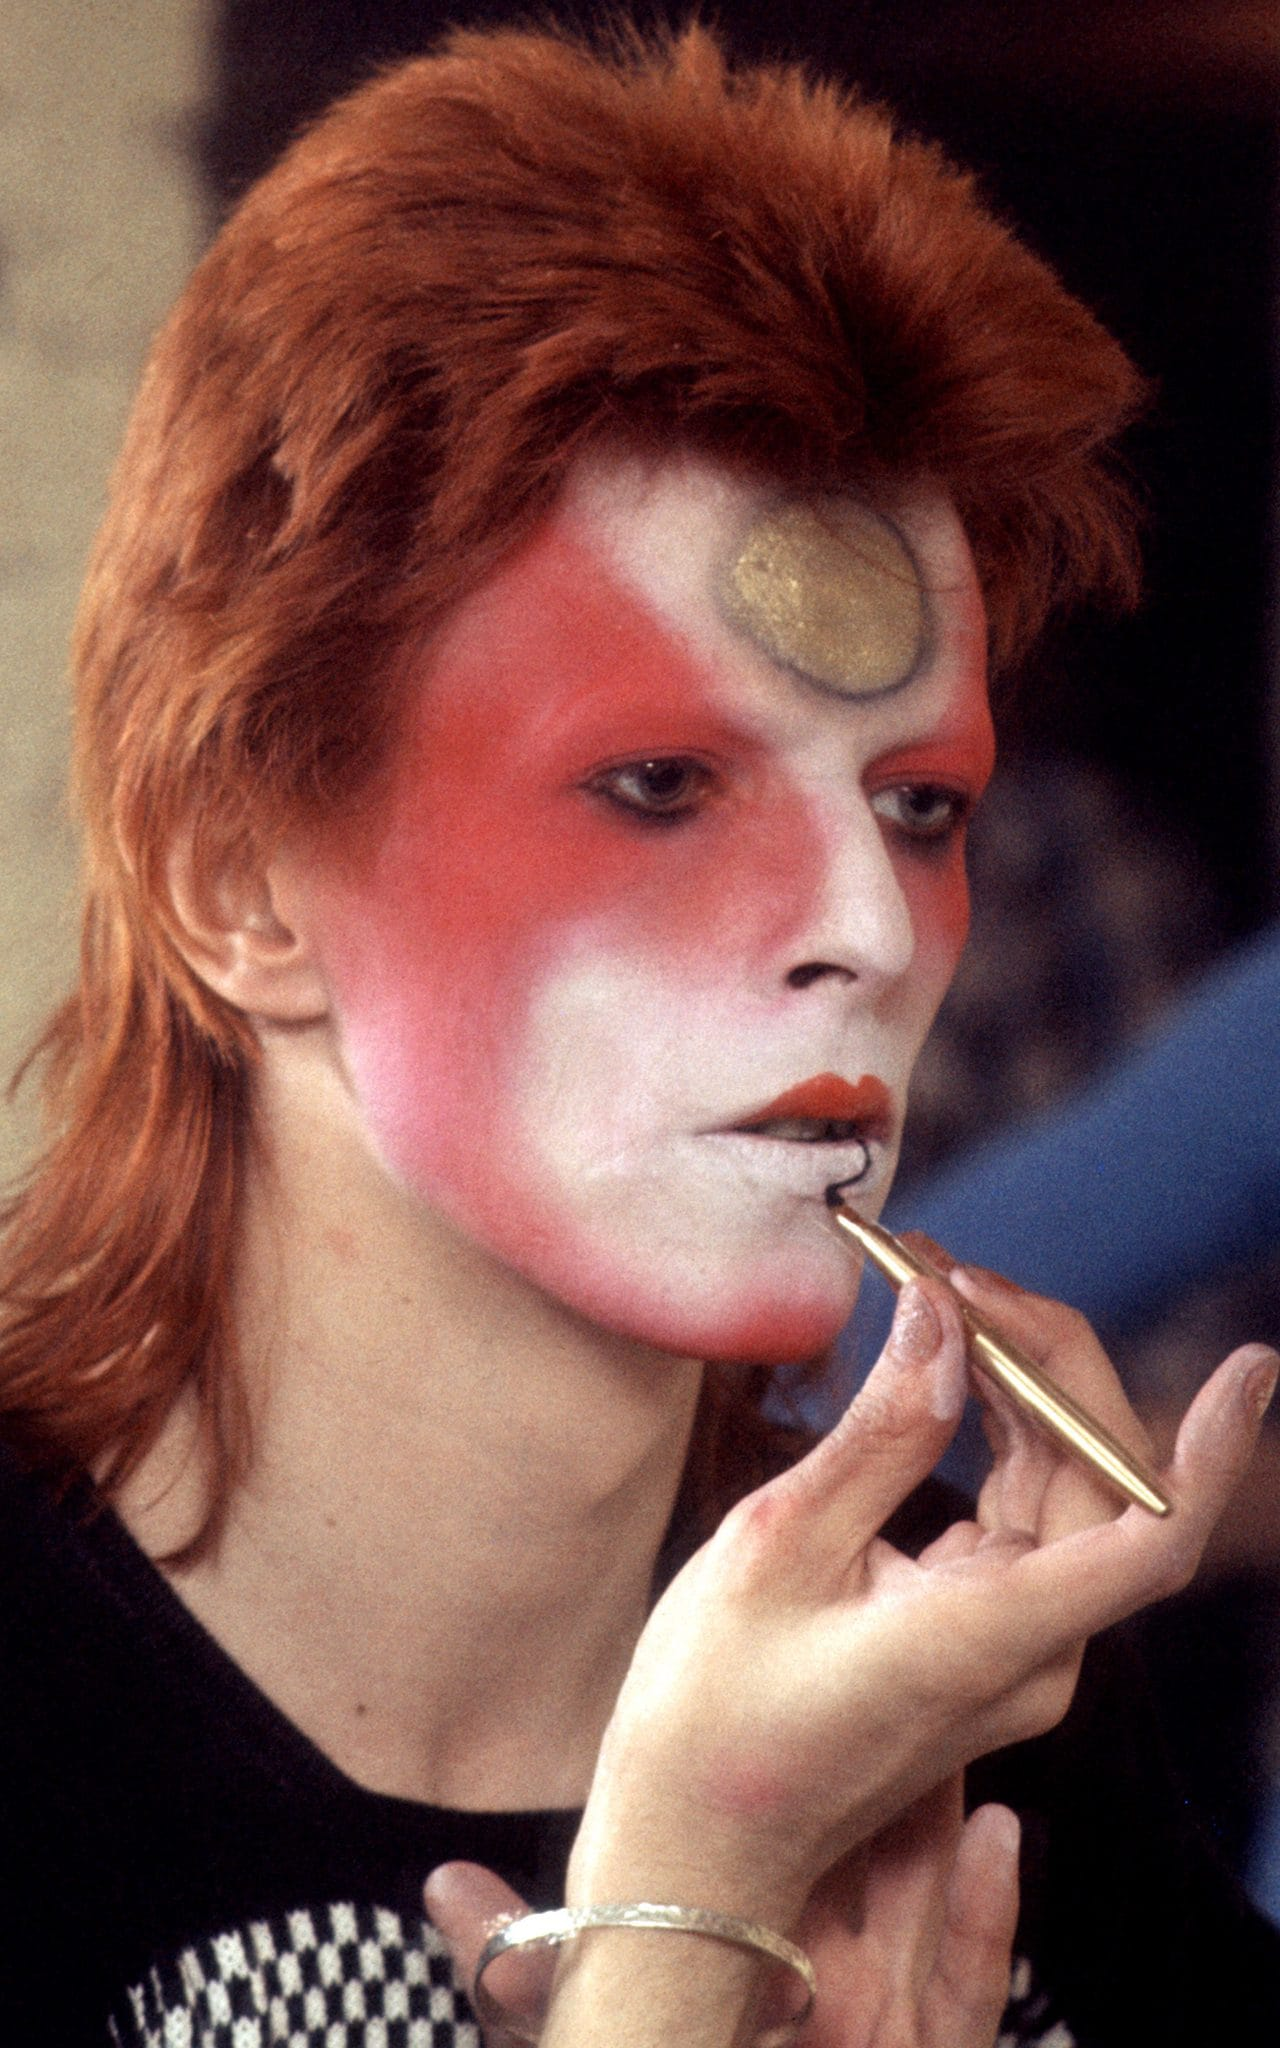 David Bowie, Boy George, Prince, Steven Tyler, Kiss, Mick Jagger, Iggy Pop, Ozzy Osbourne, makeup, stage makeup, rock & roll, punk fashion